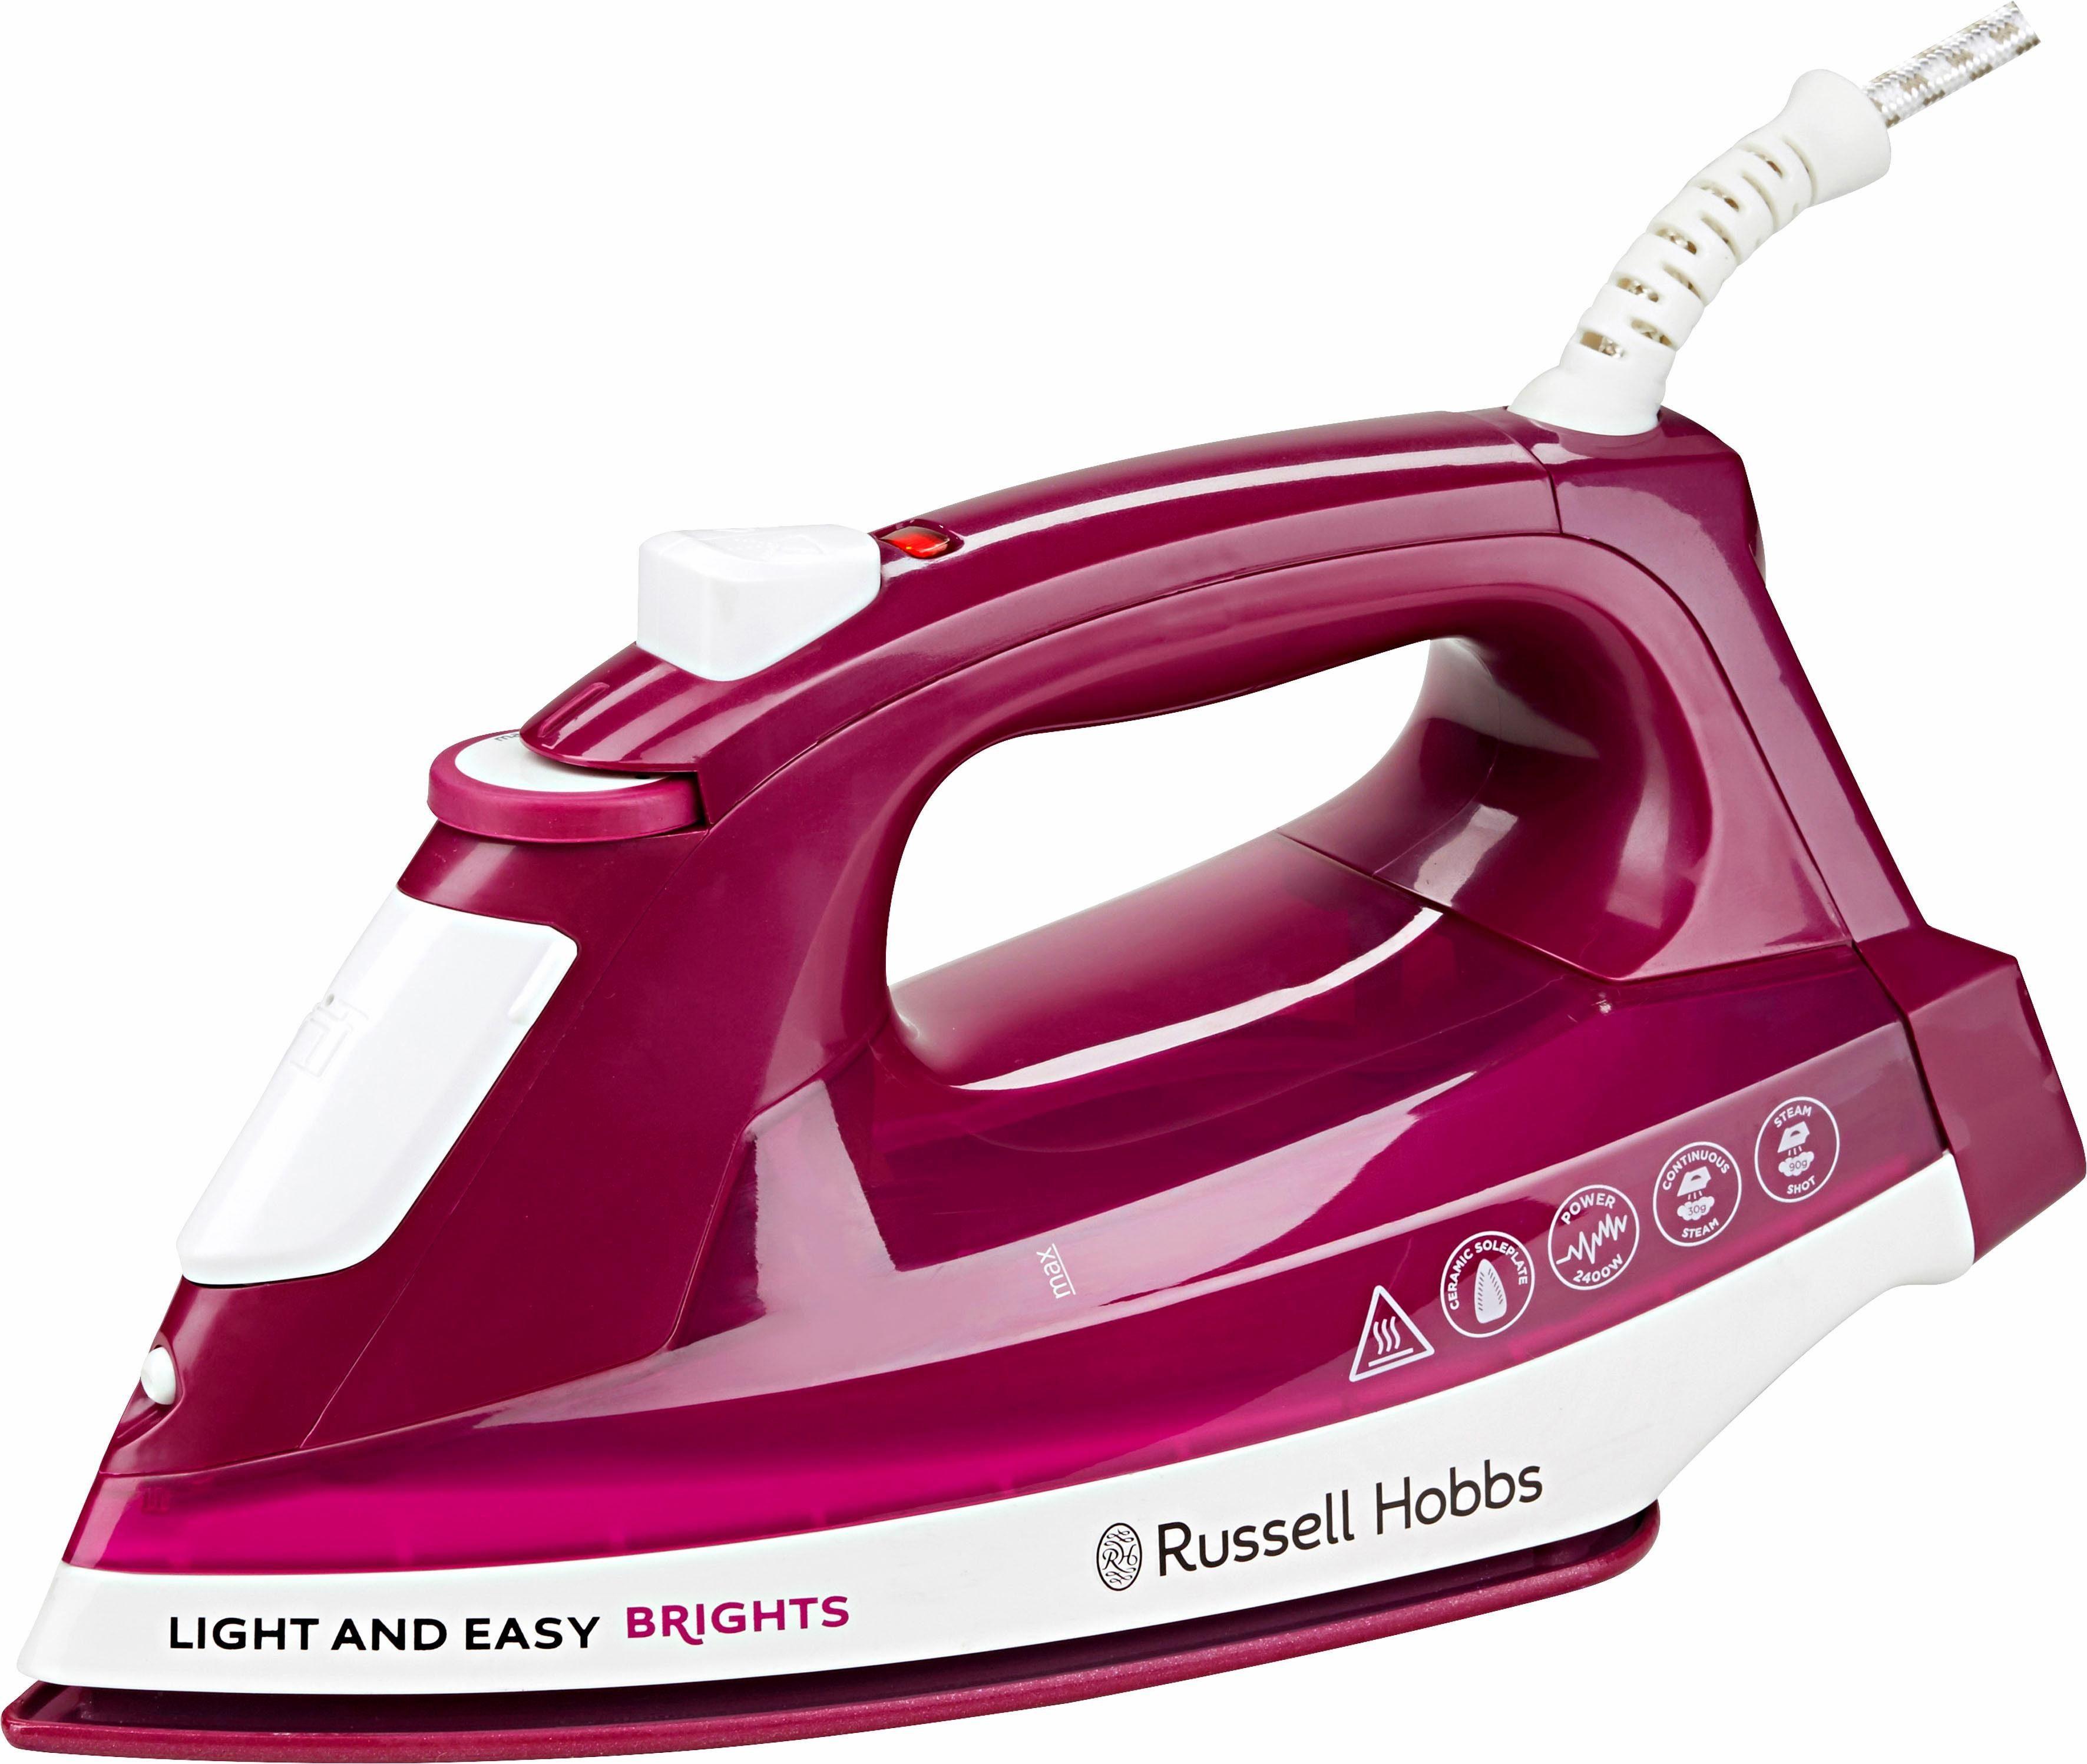 Russell Hobbs Dampfbügeleisen Light&Easy Brights 24820-56, Keramik-Bügelsohle, 2400 Watt, Mulberry